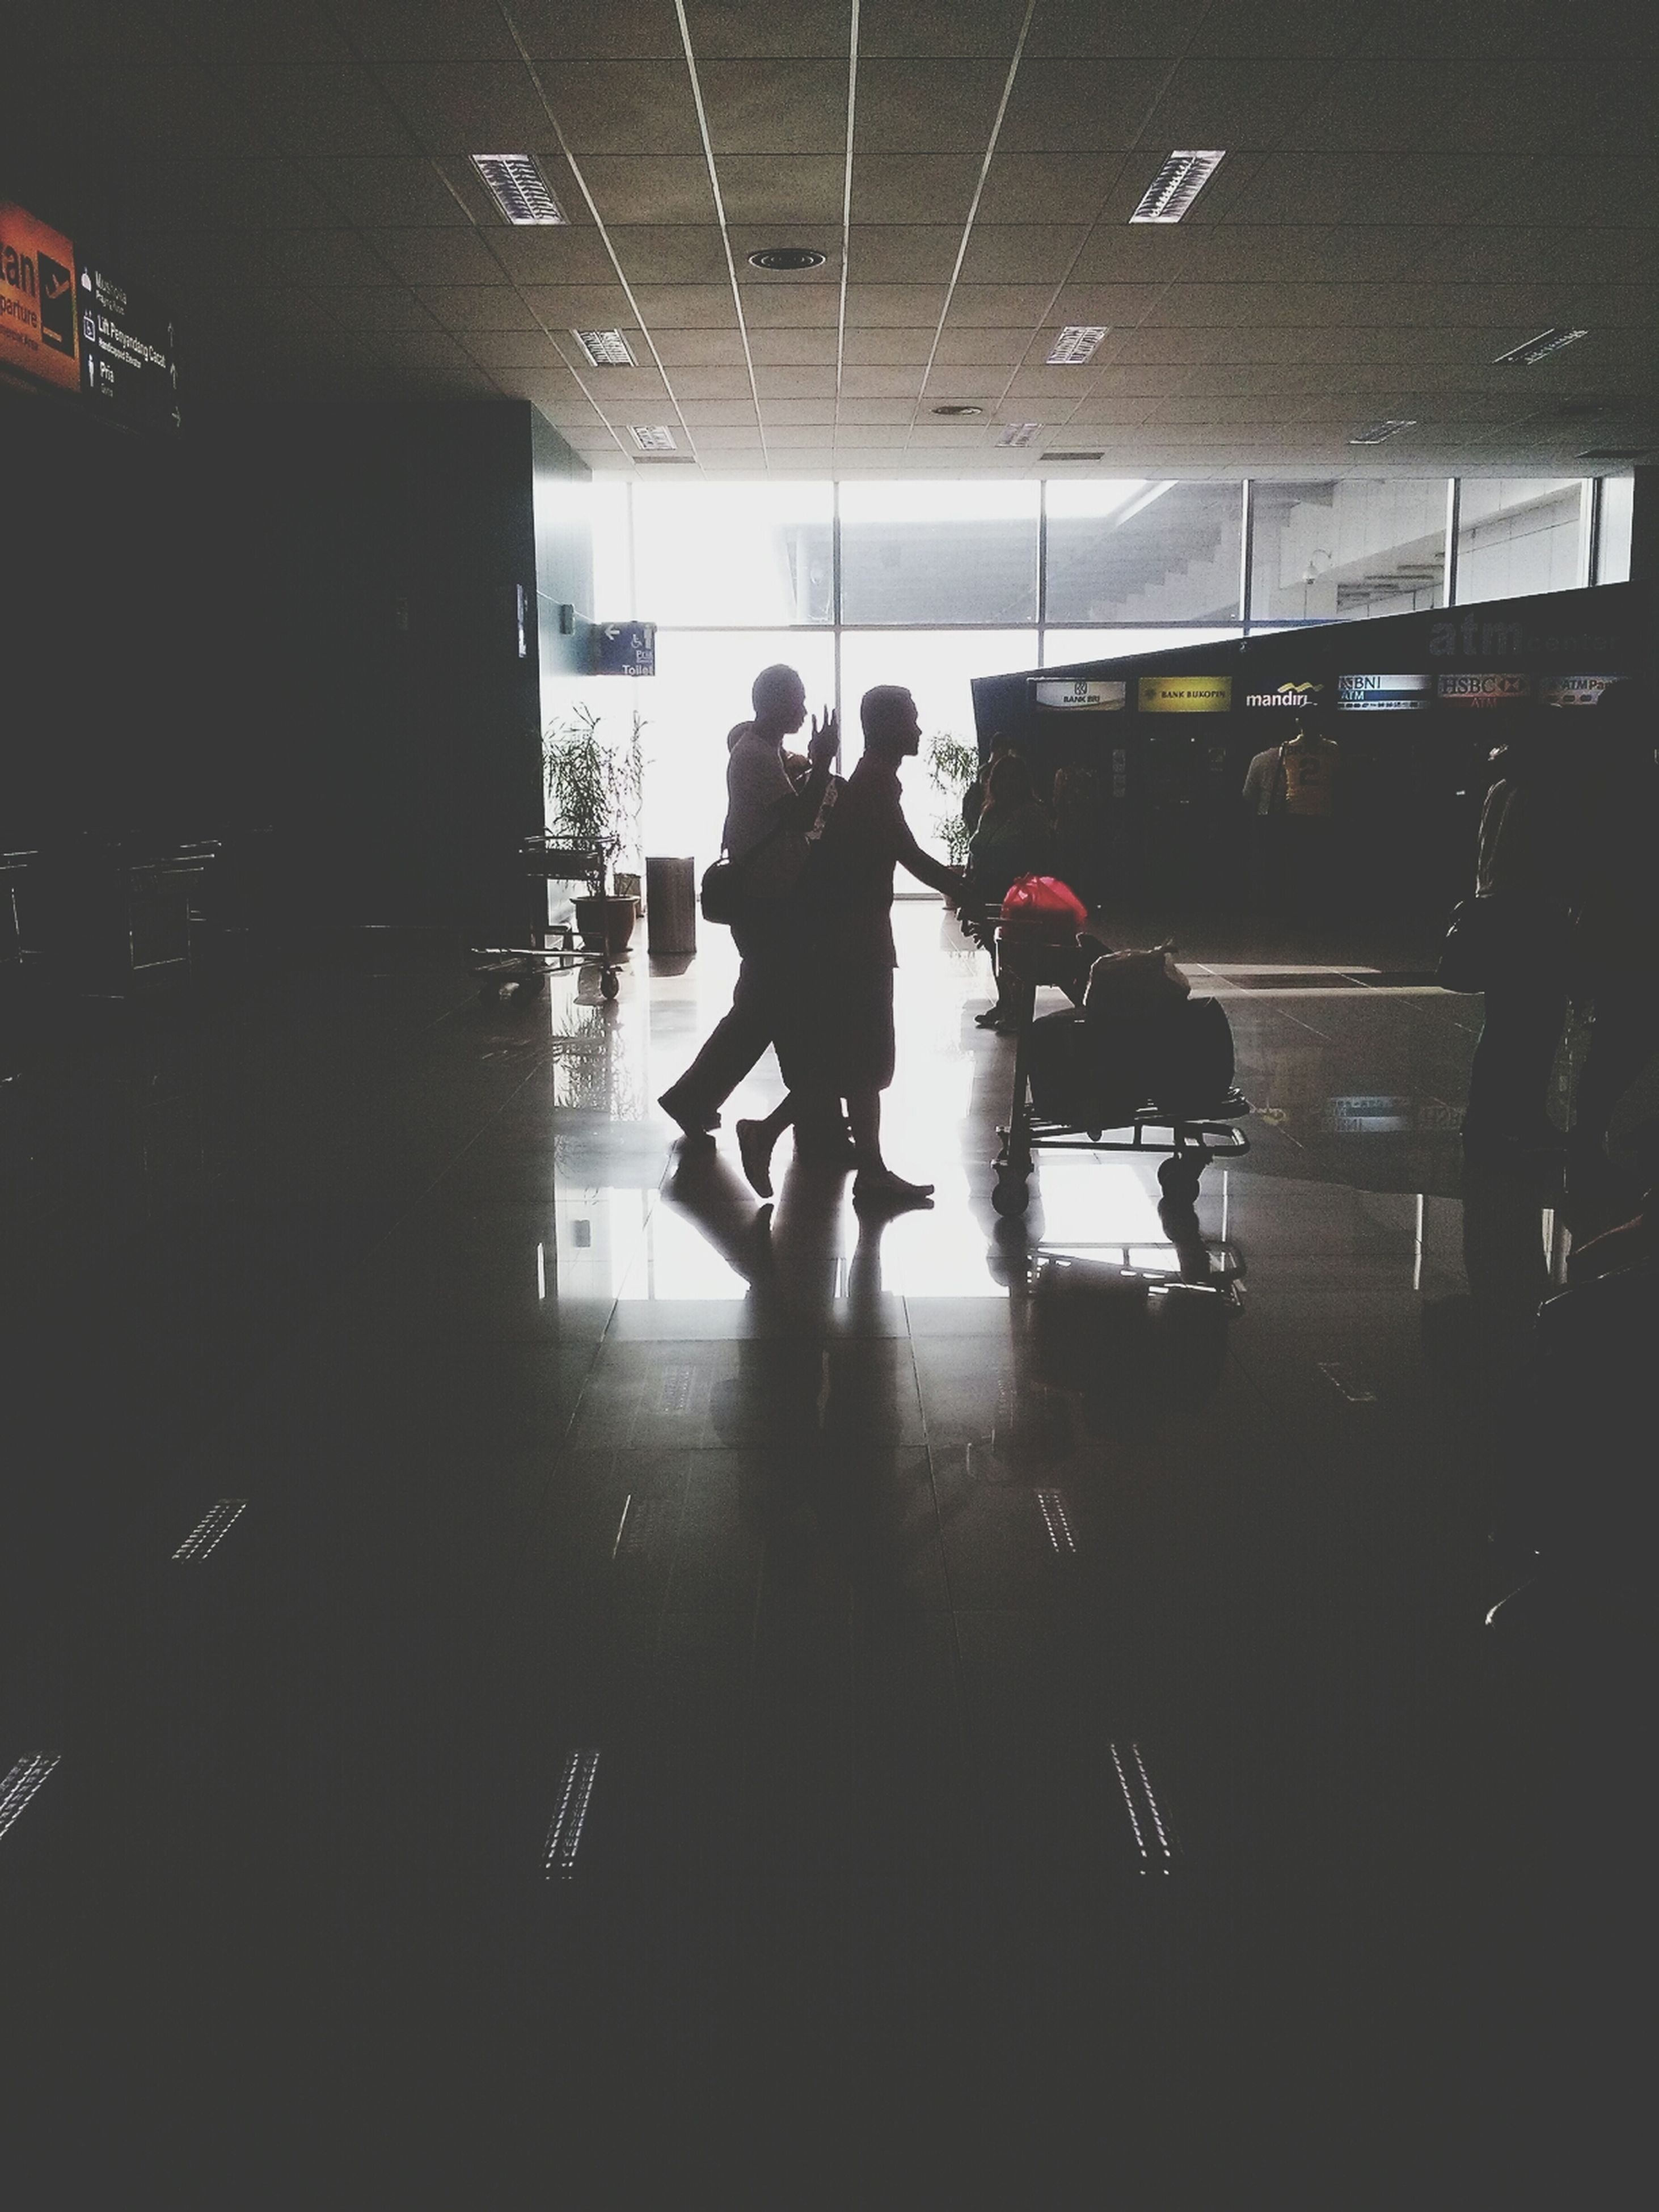 indoors, men, lifestyles, transportation, illuminated, person, passenger, leisure activity, walking, public transportation, mode of transport, travel, full length, medium group of people, subway, airport, subway station, journey, city life